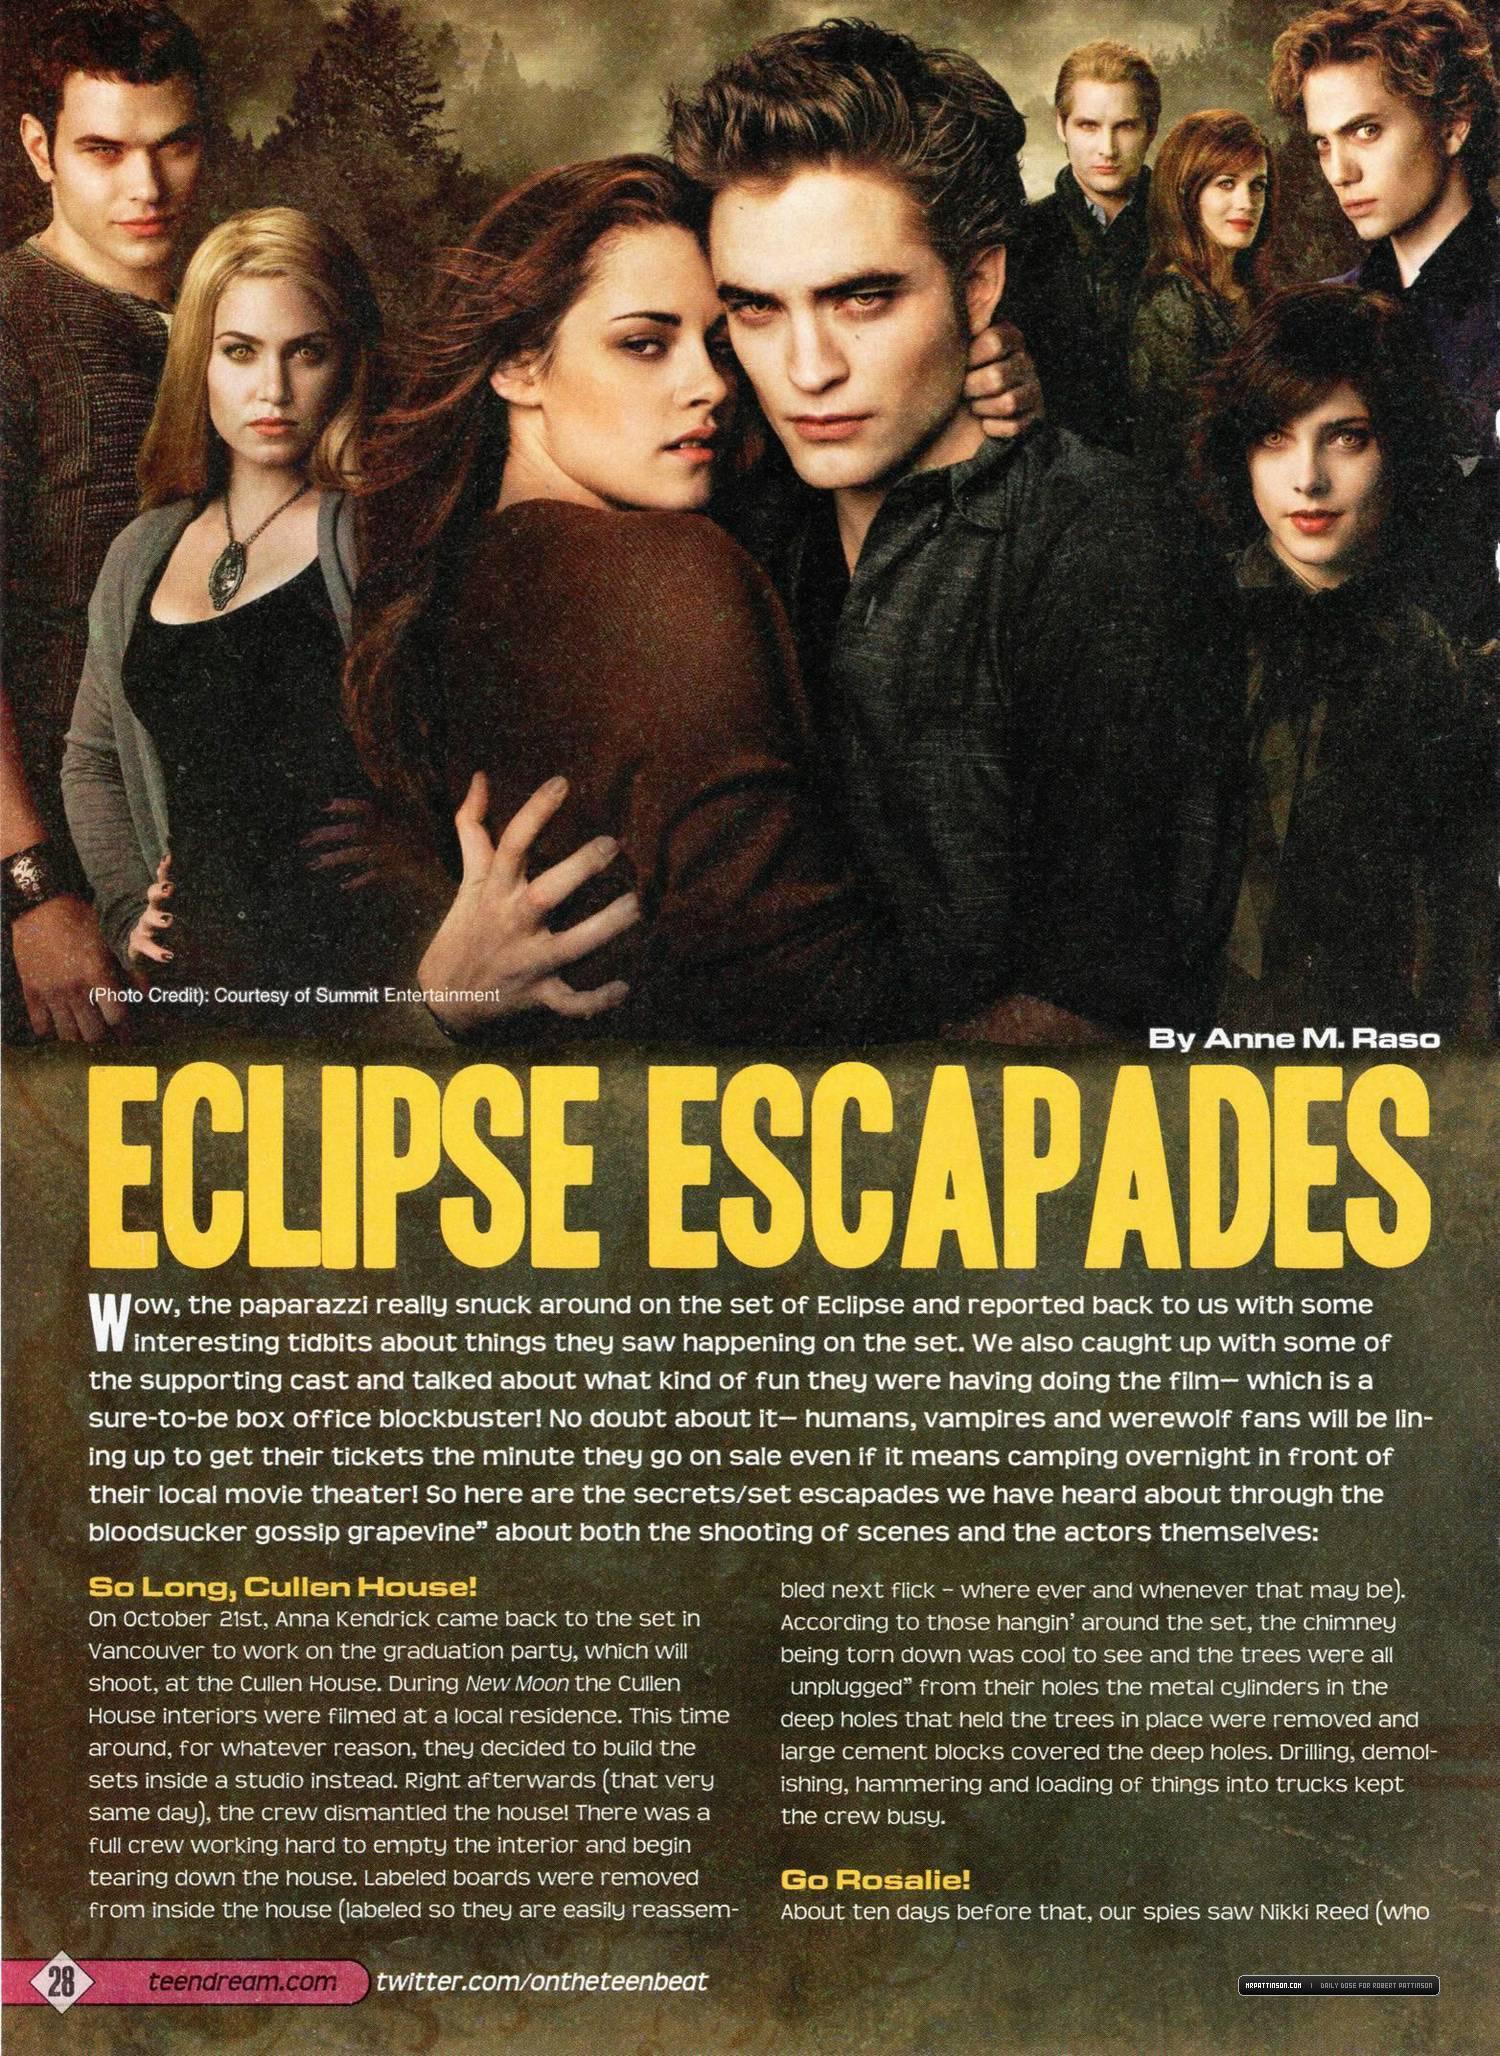 Teen Dream Magazine Featuring Robert Pattinson & Eclipse